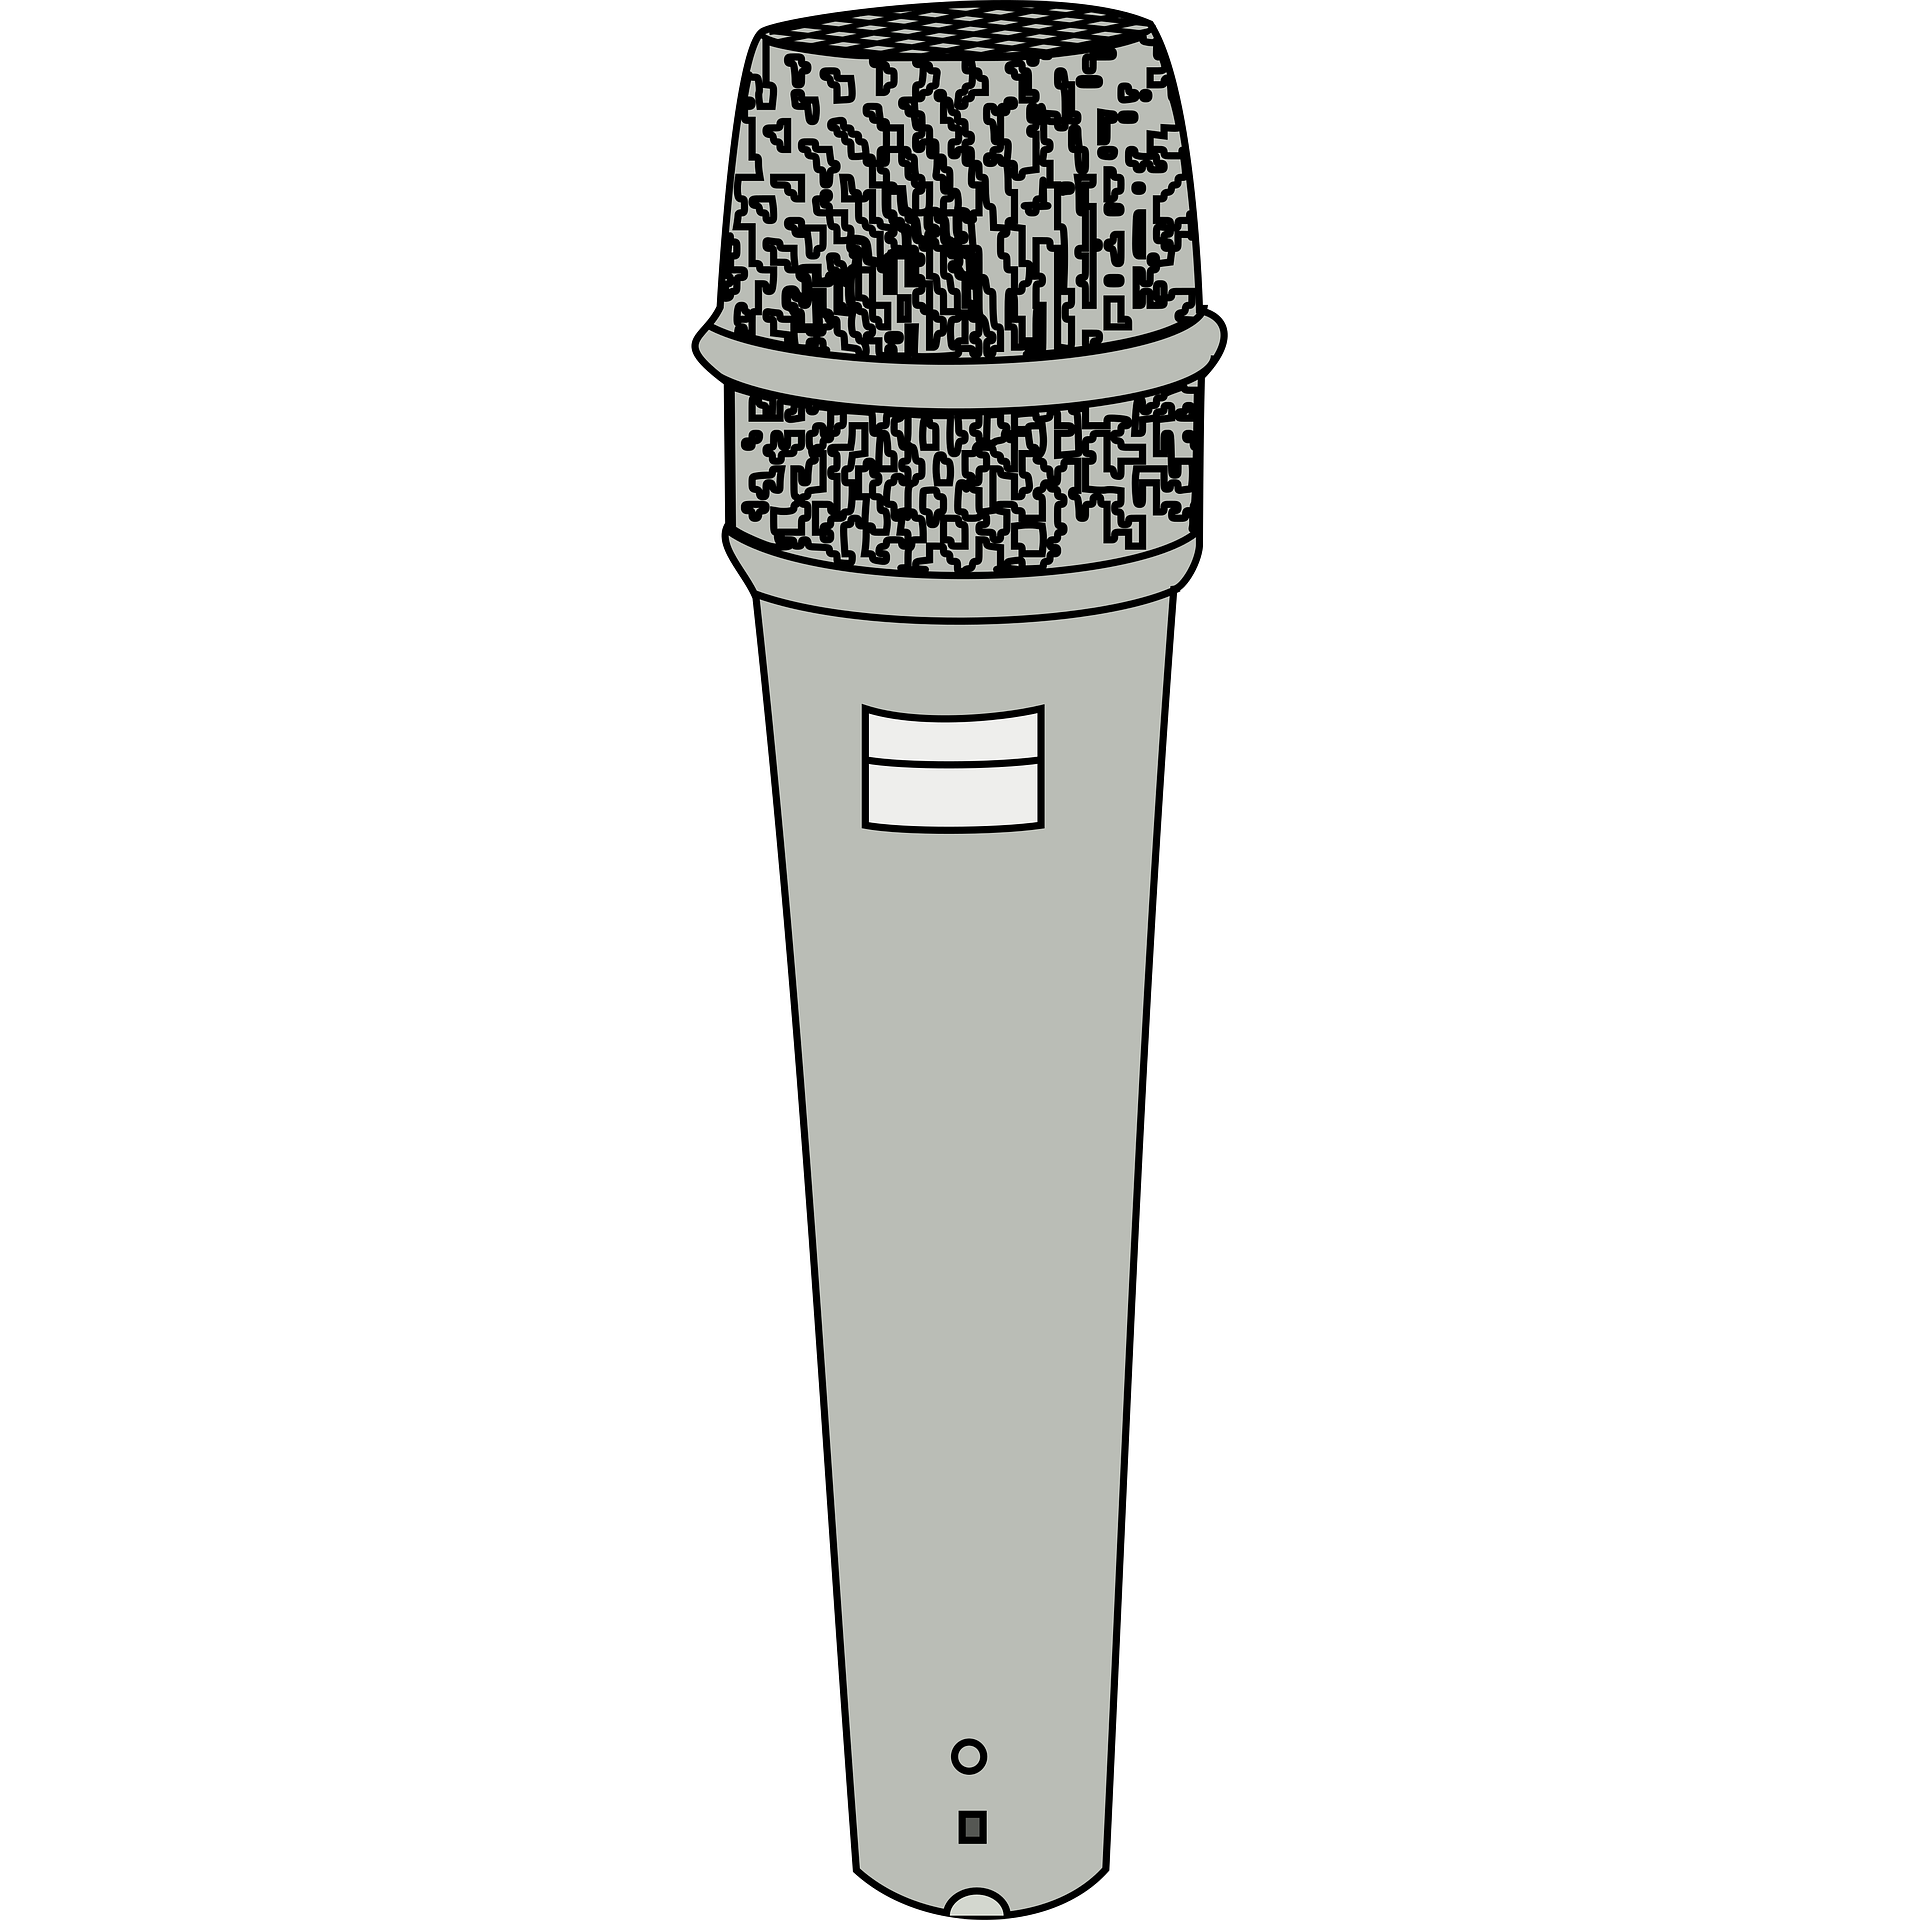 Clipart music microphone. Illustration london mums magazine